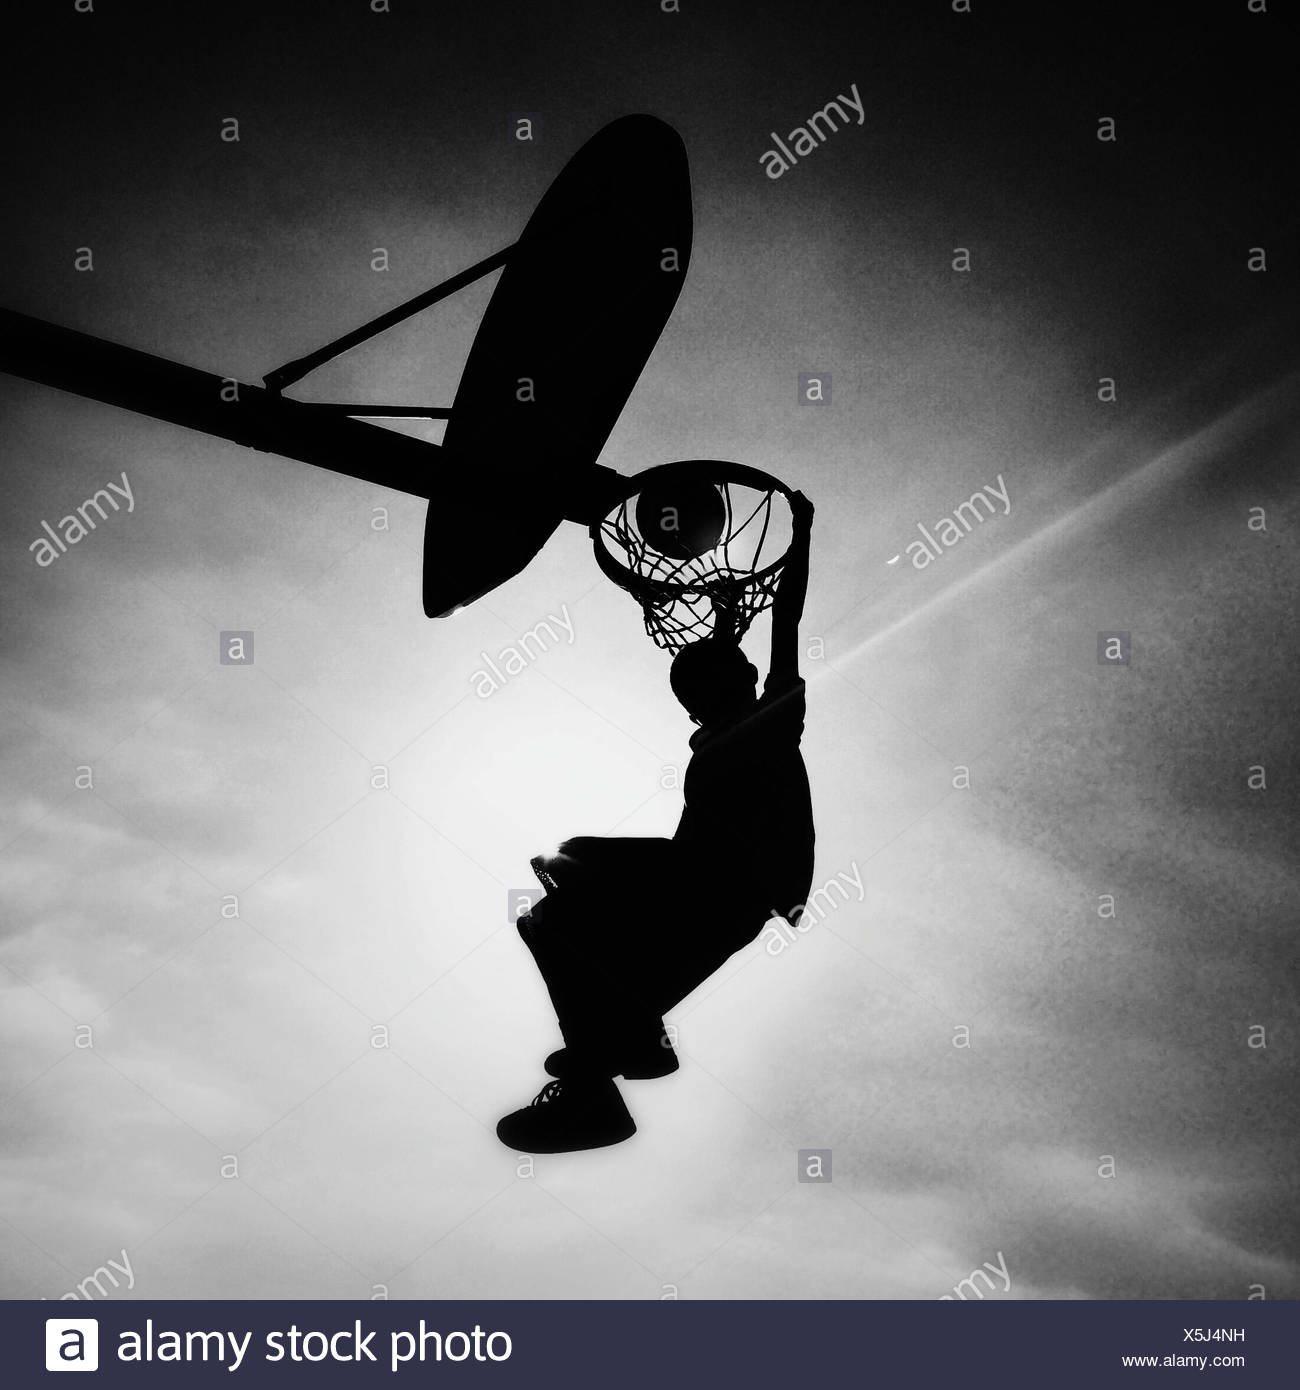 Silhouette of boy playing basketball scoring slam dunk - Stock Image